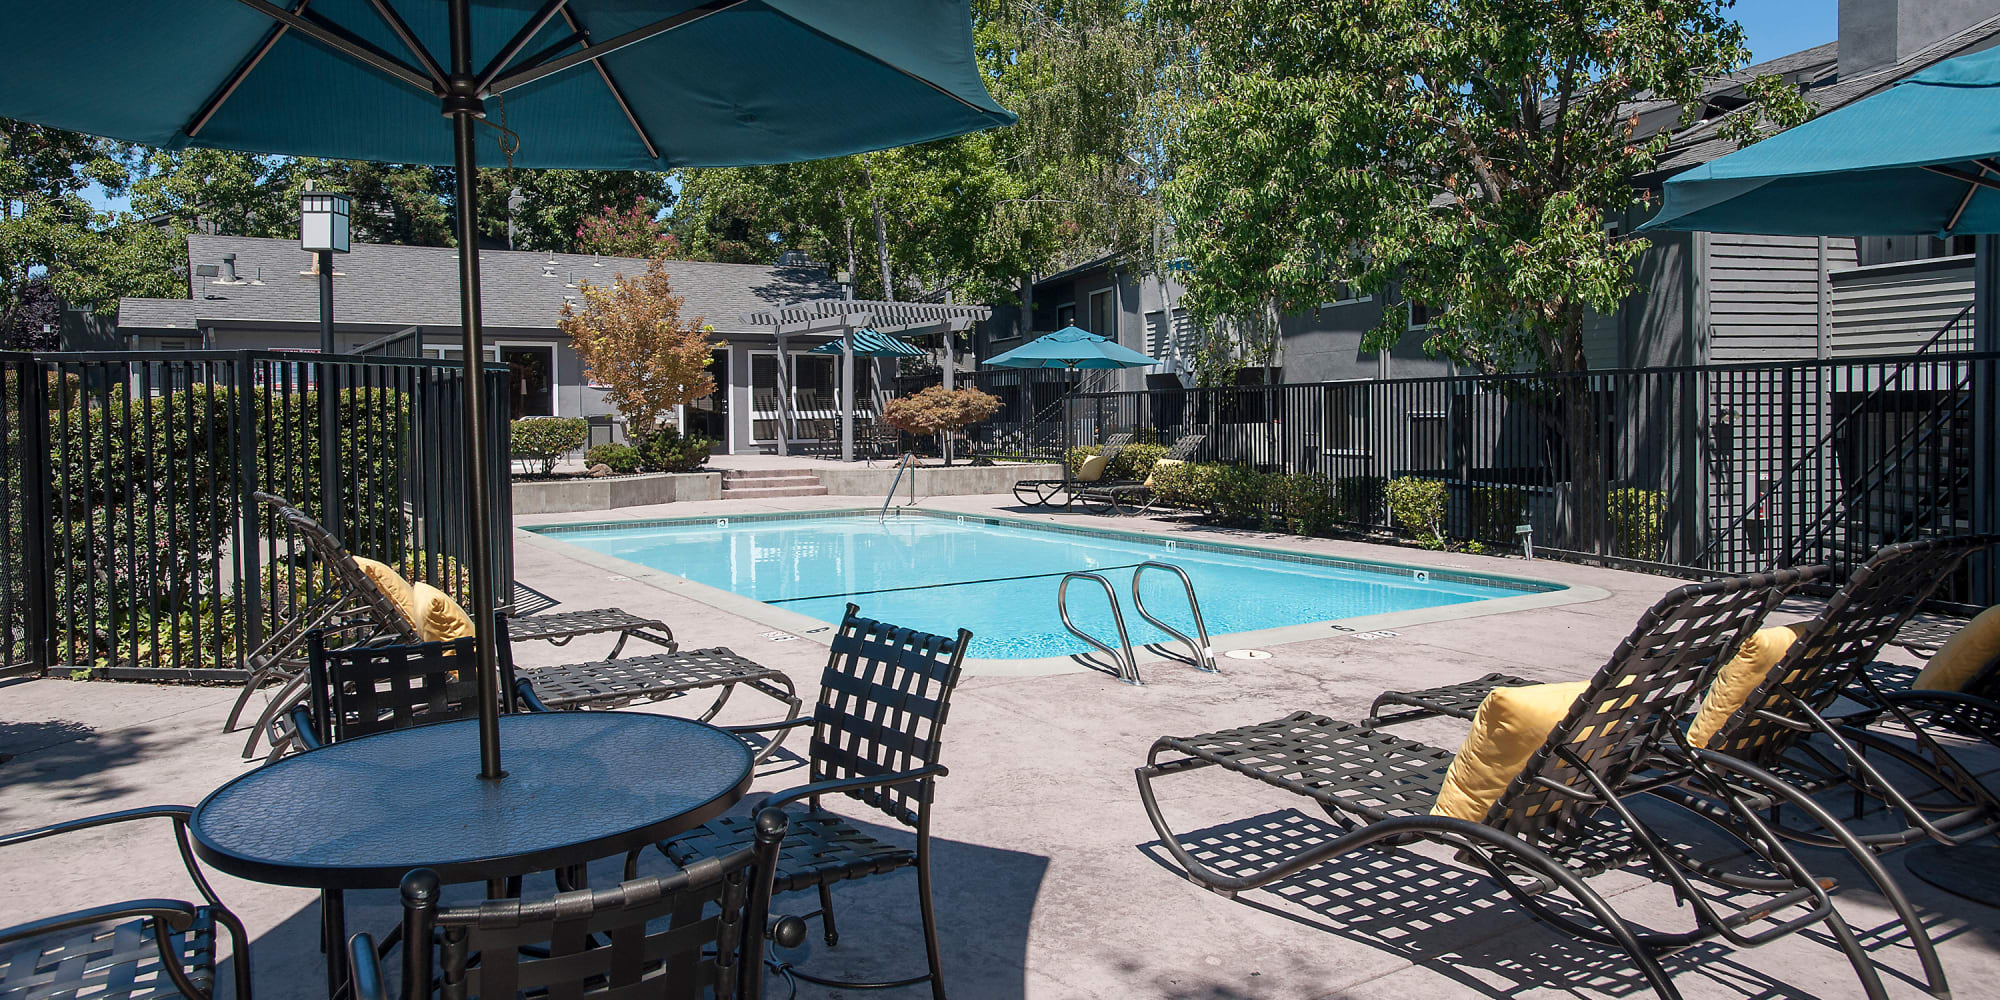 Apartments at Plum Tree Apartment Homes in Martinez, California